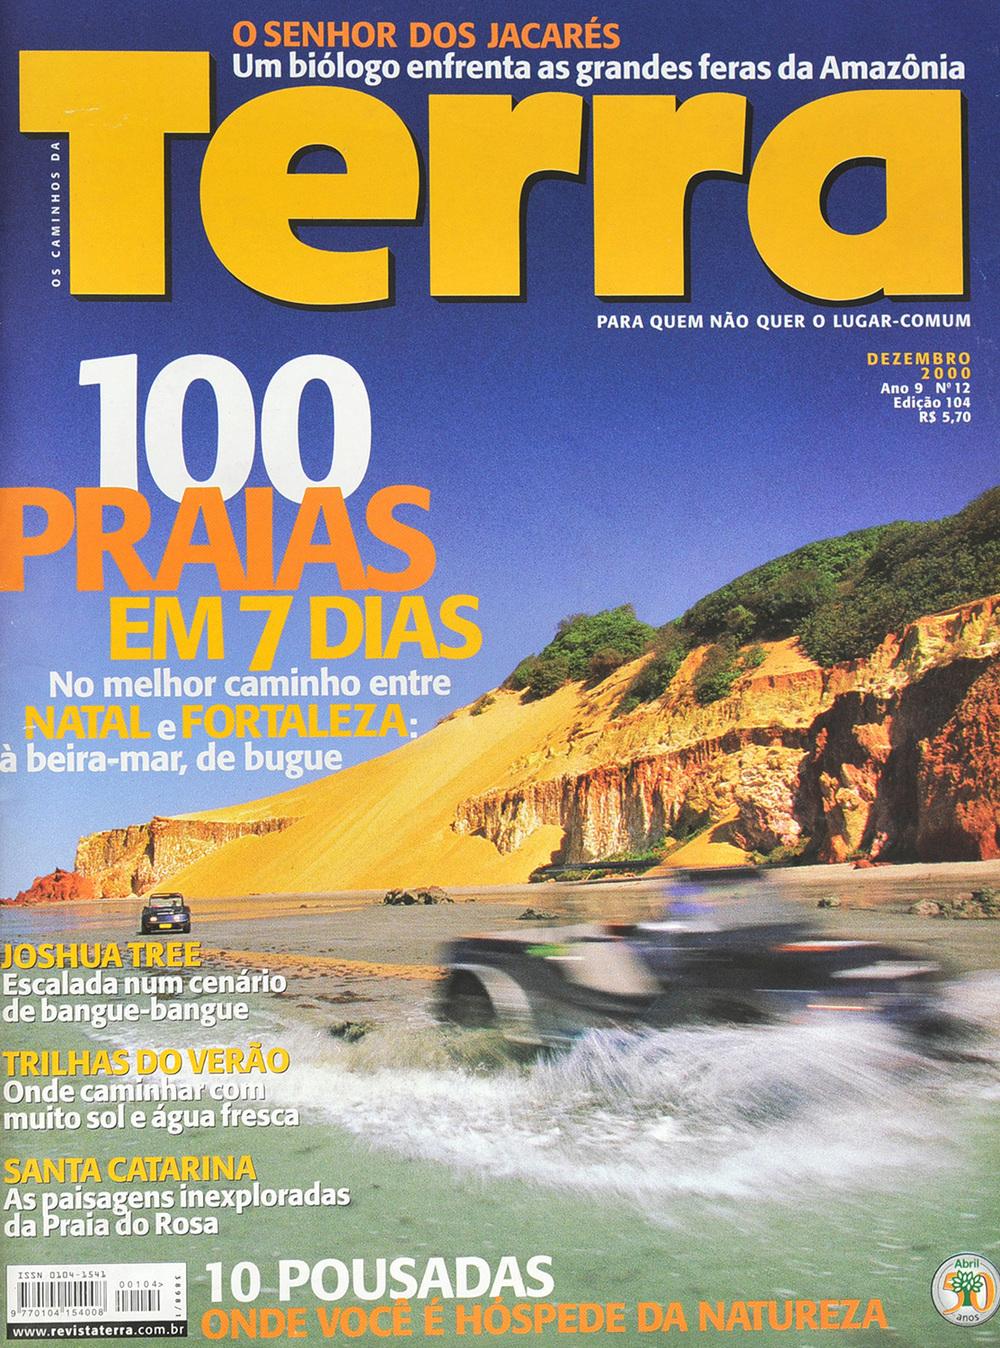 0089_01_terra_praias.jpg